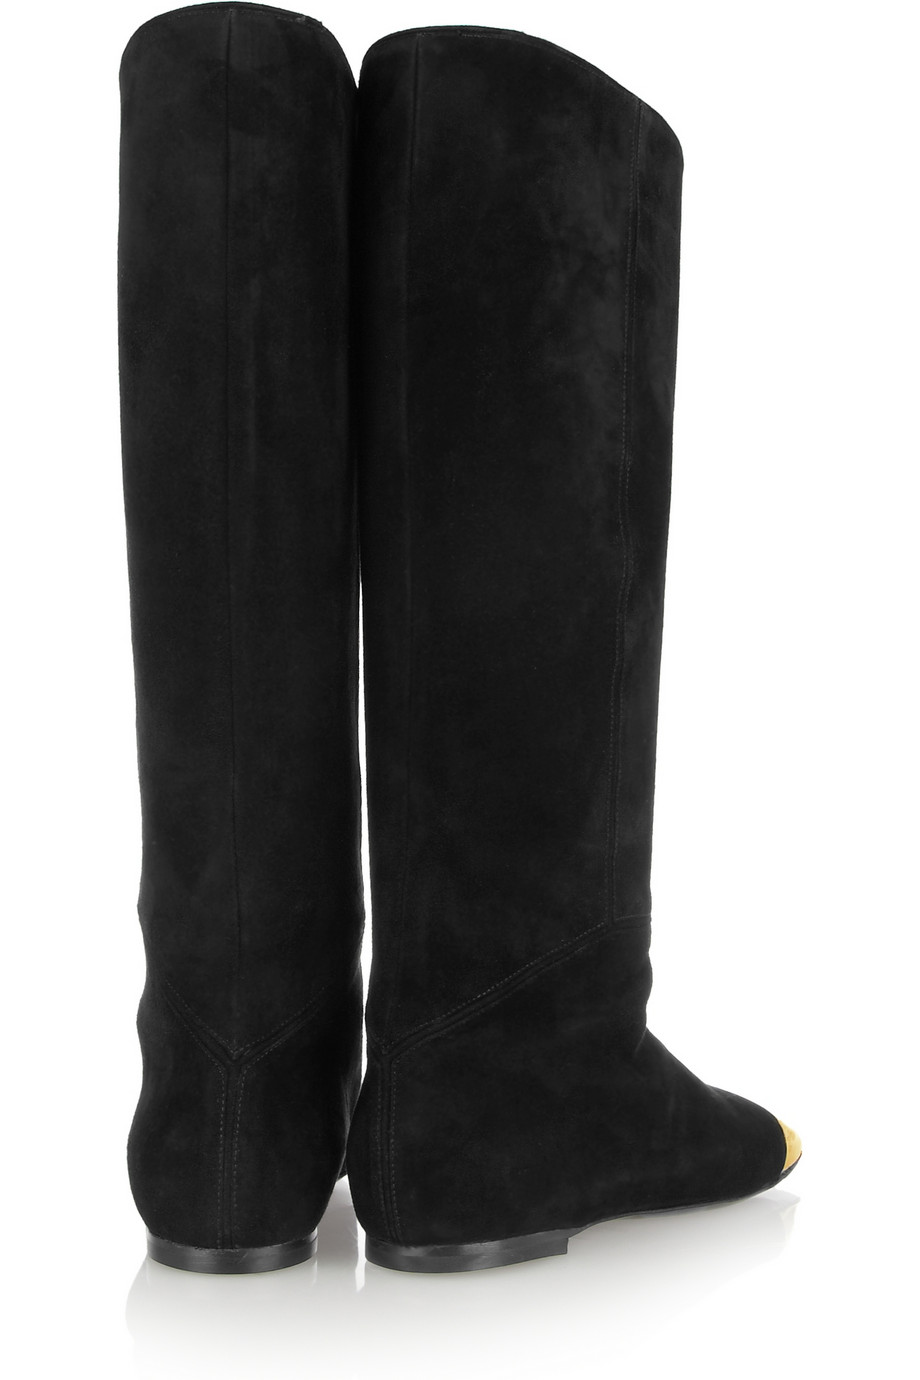 Lyst Saint Laurent Rita Flat Suede And Metal Boots In Black